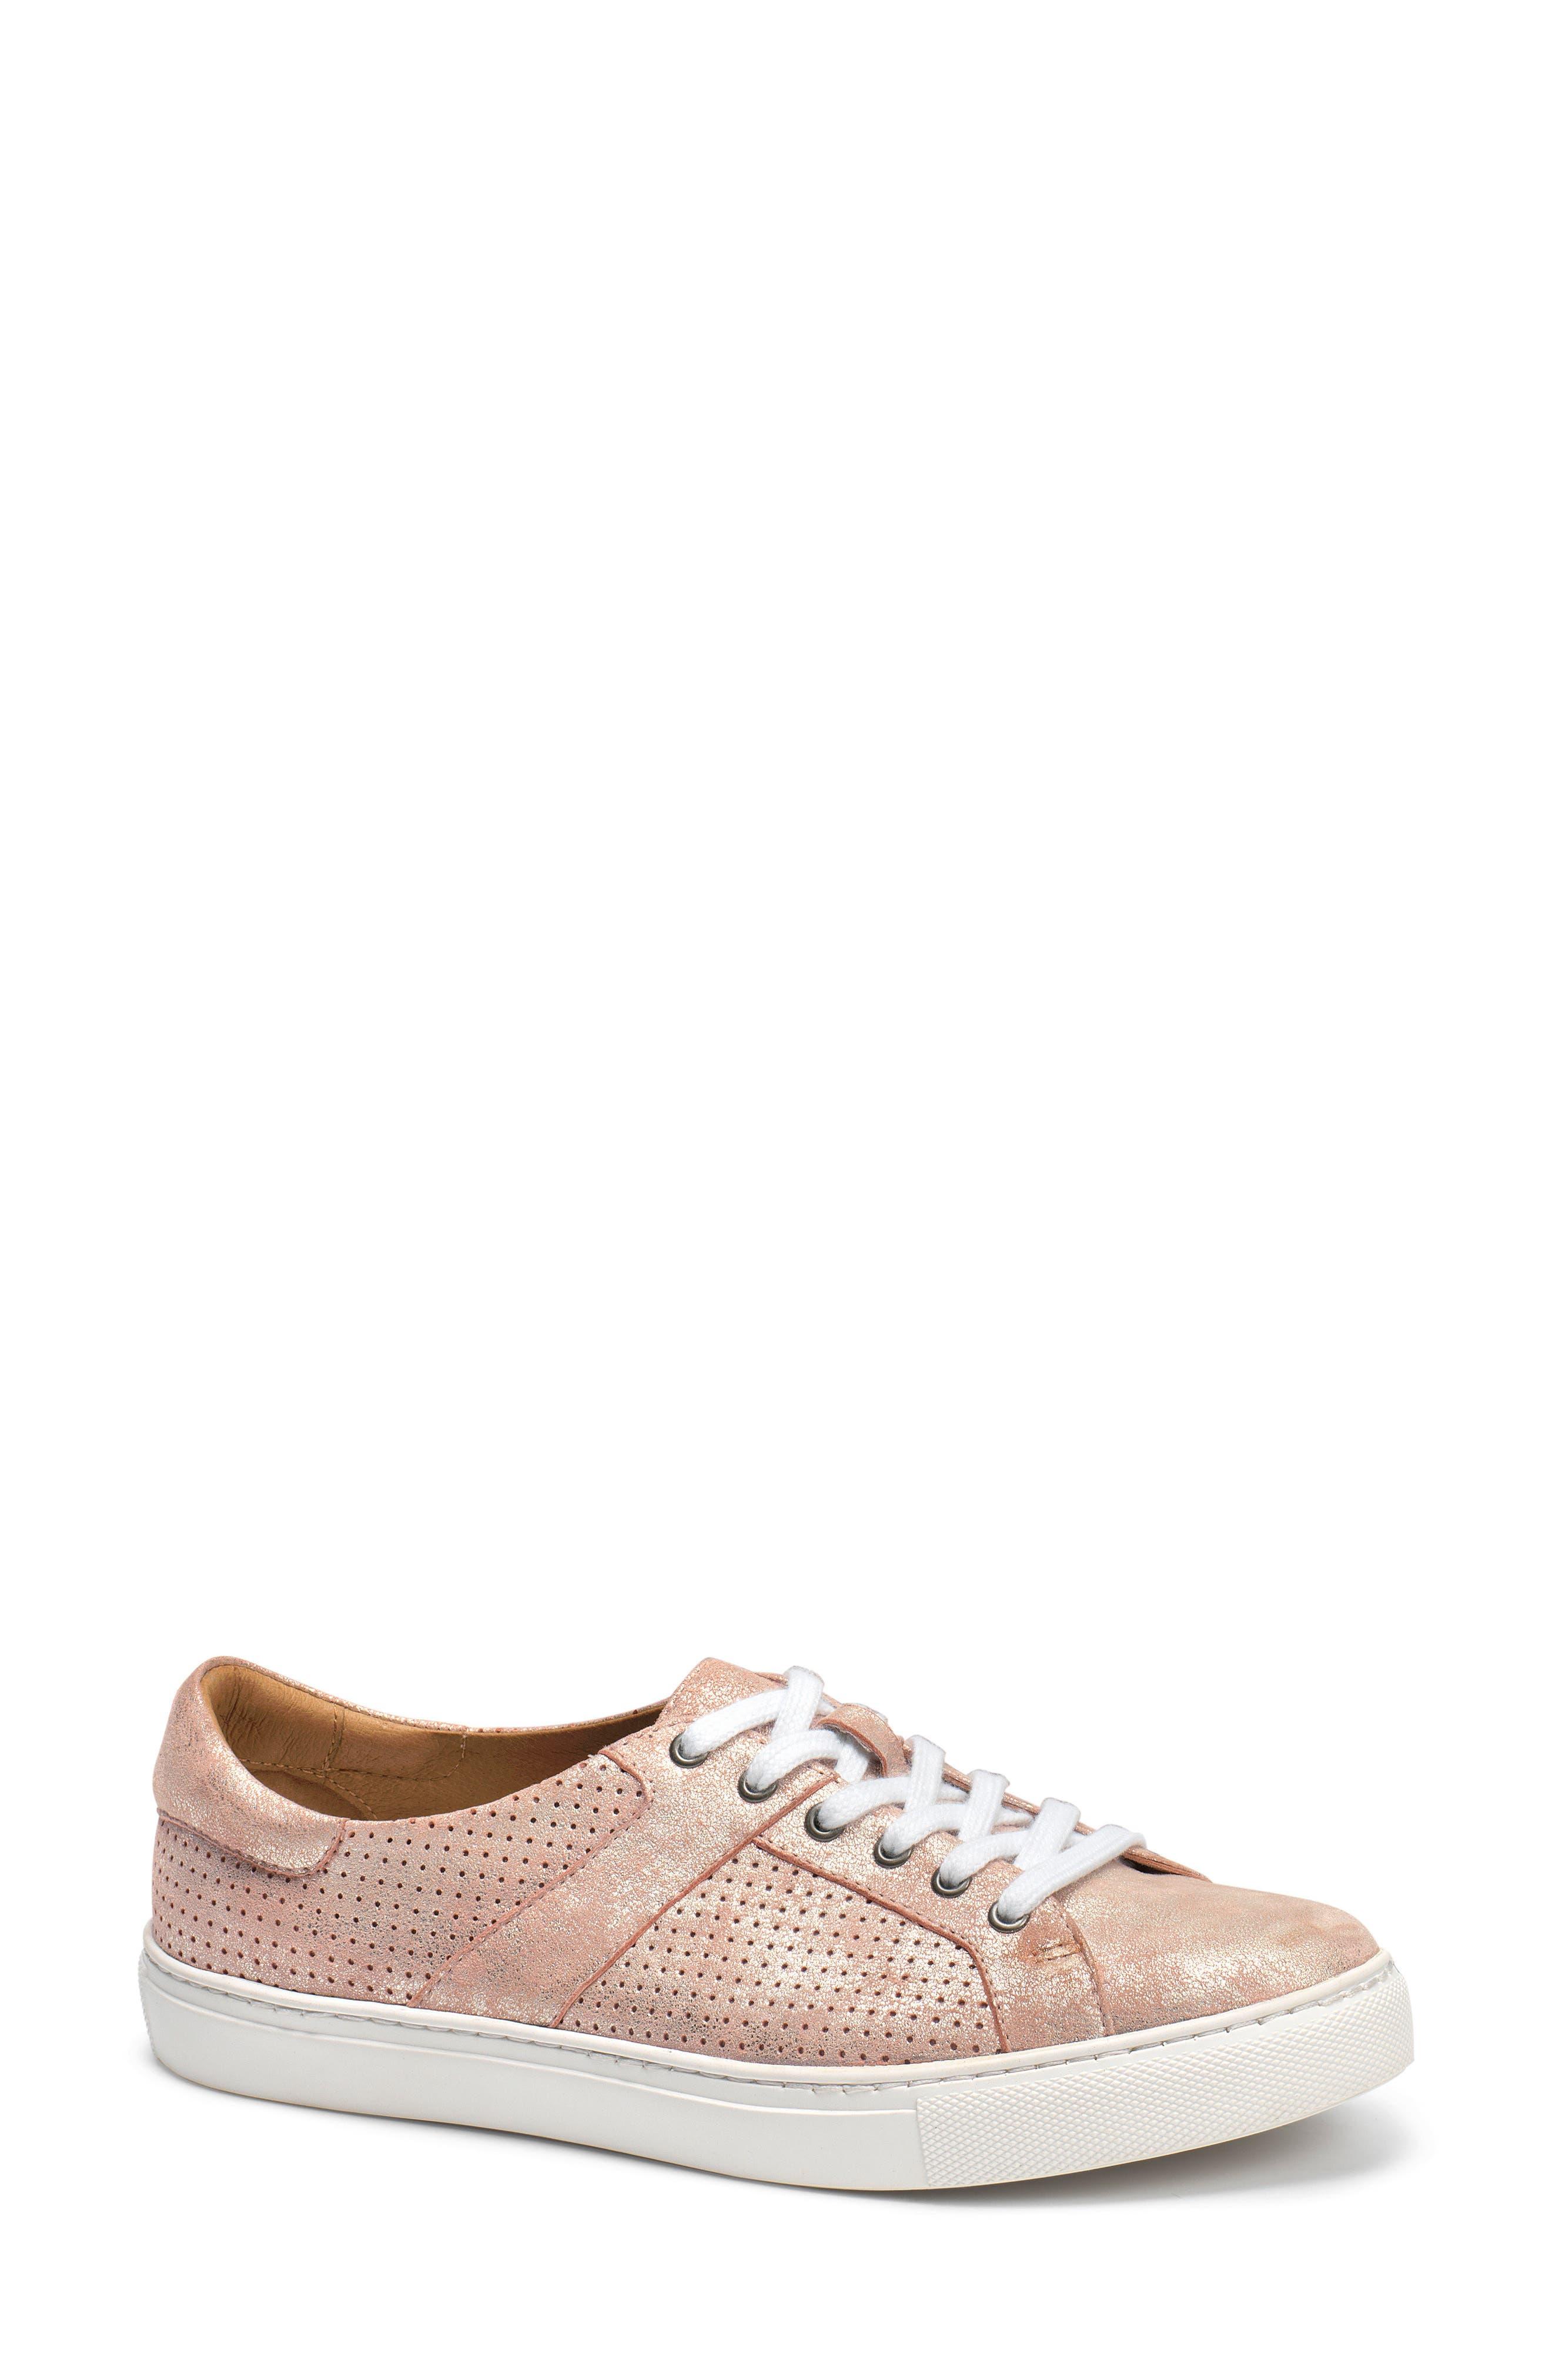 Trask Lindsey Sneaker- Pink